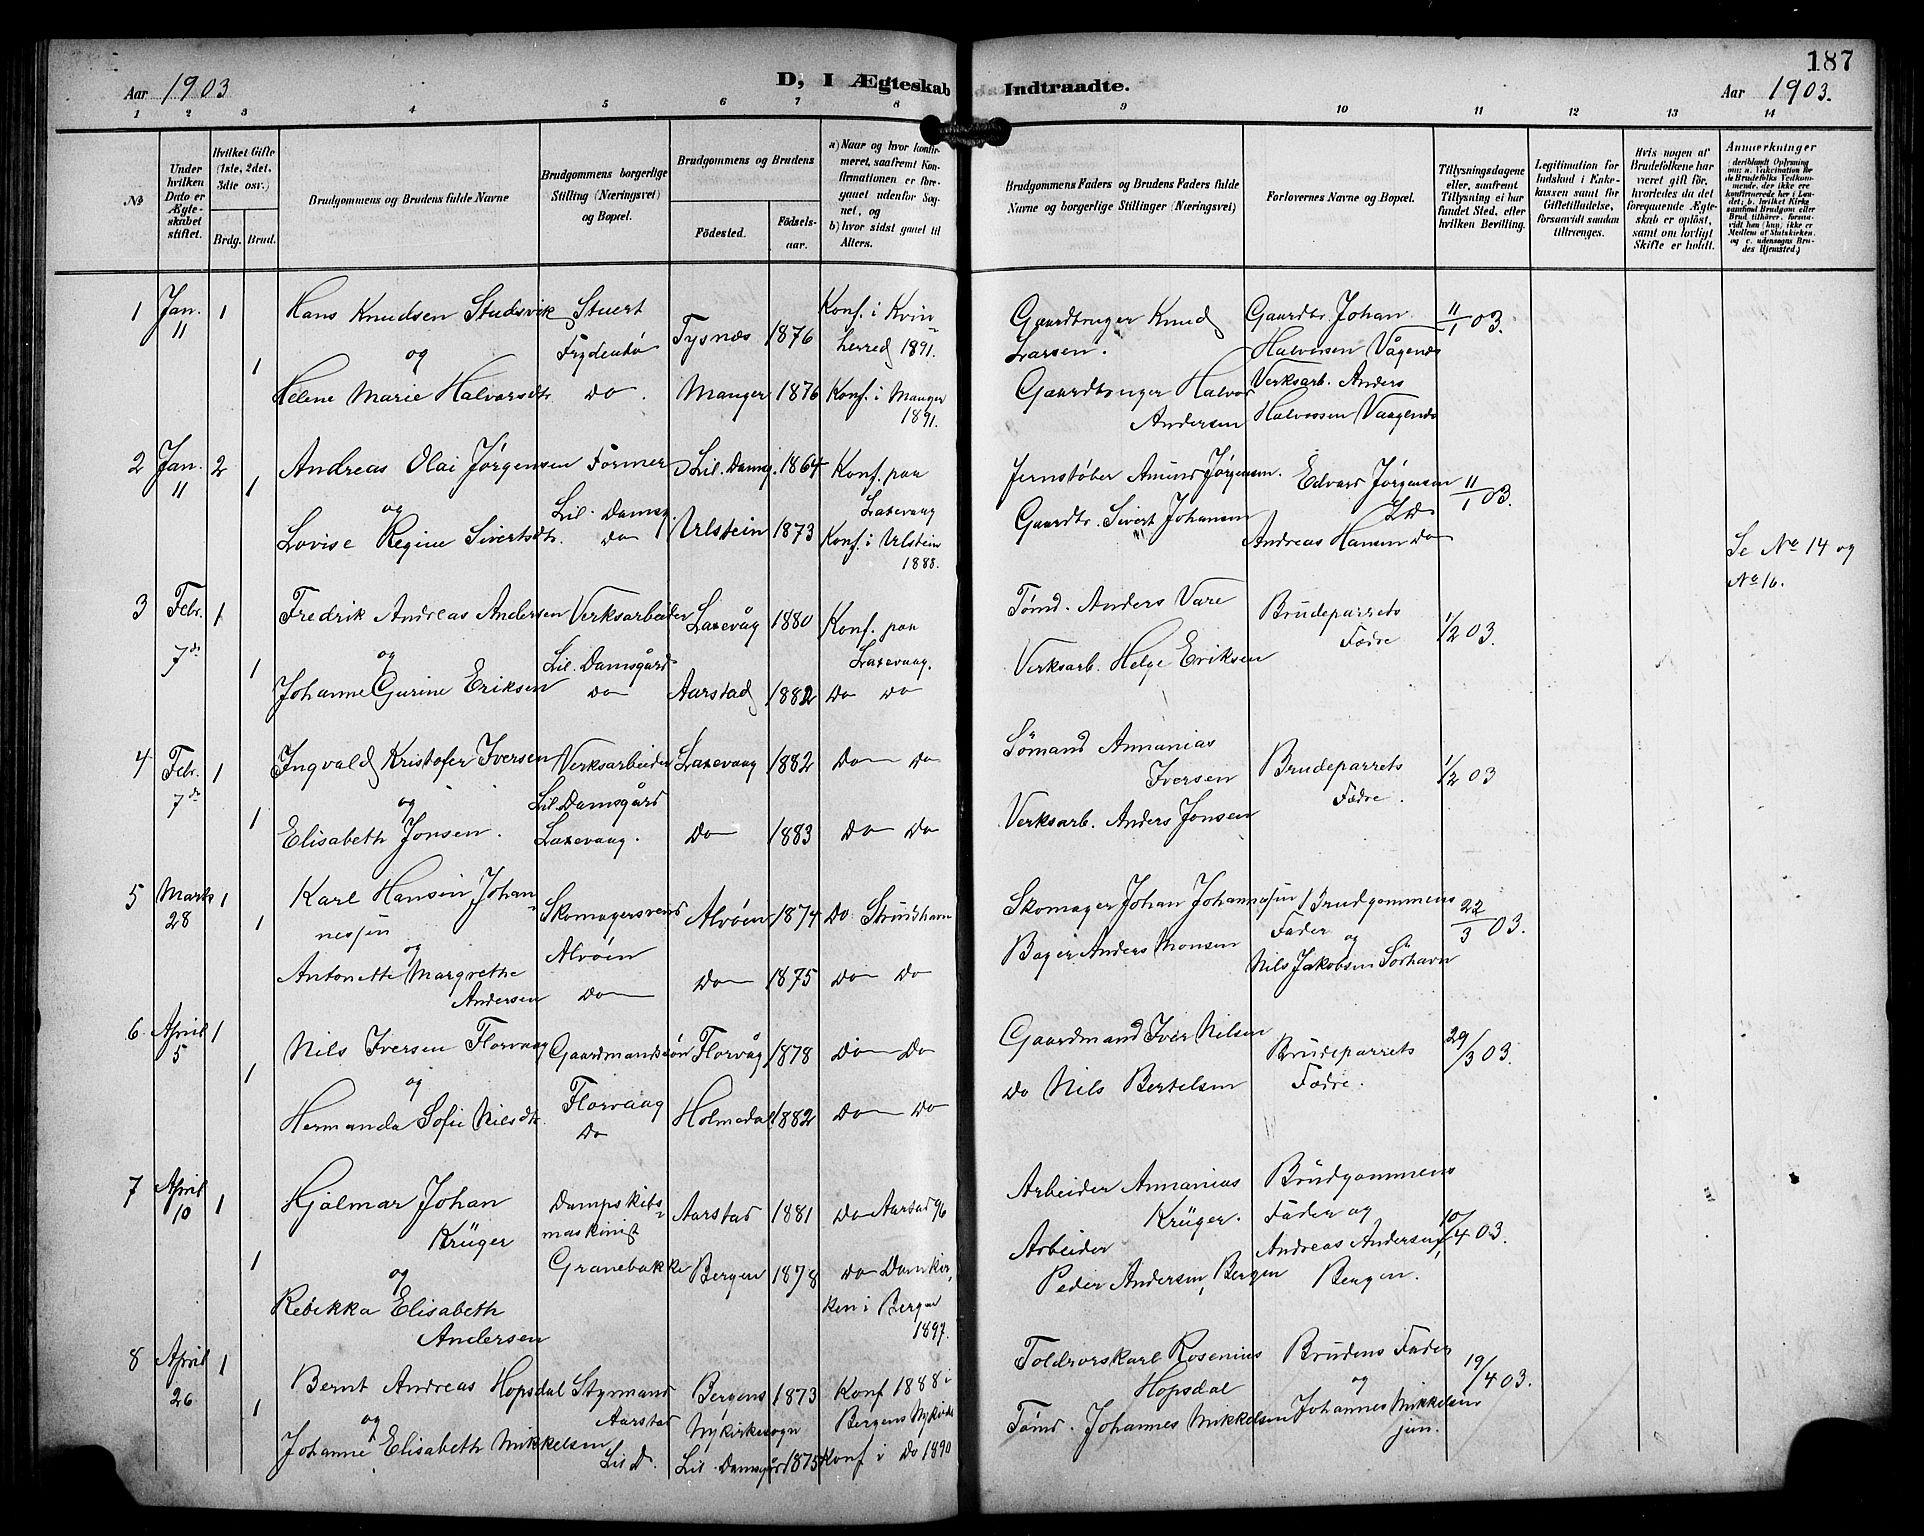 SAB, Laksevåg Sokneprestembete, H/Ha/Hab/Haba/L0004: Klokkerbok nr. A 4, 1899-1909, s. 187